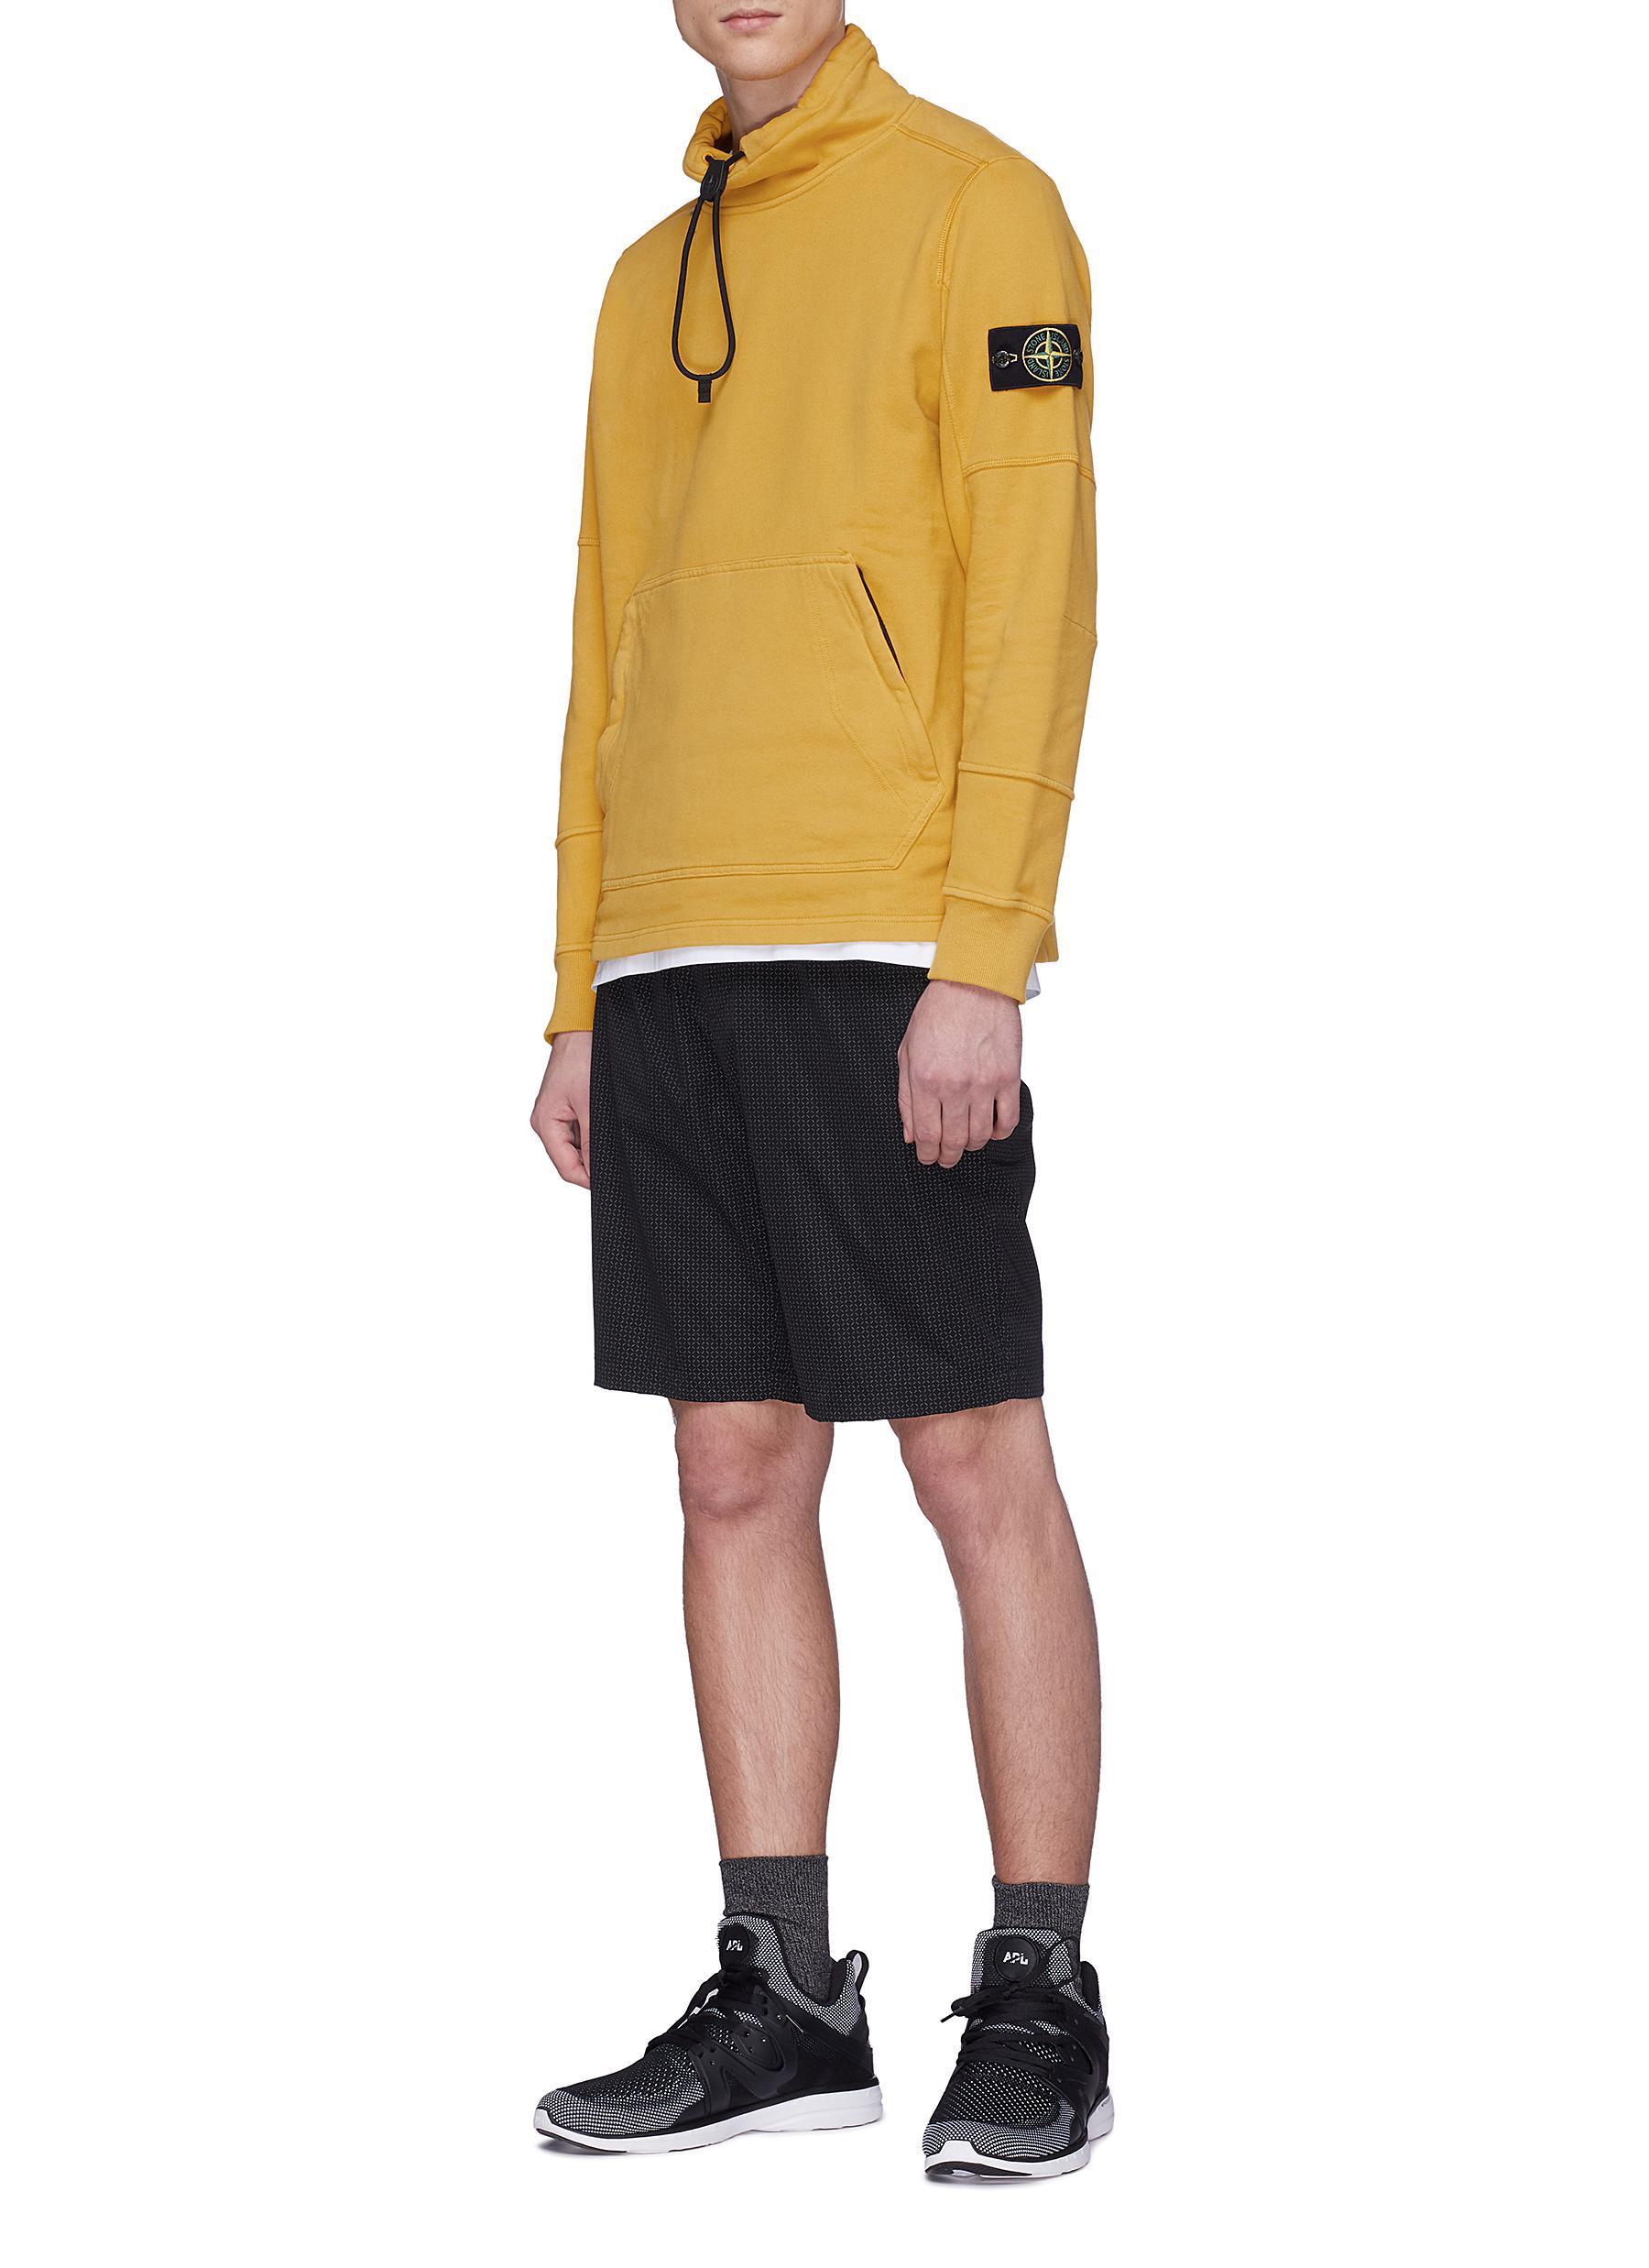 c9f0ef022 Lyst - Stone Island Drawstring Funnel Neck Sweatshirt in Yellow for Men